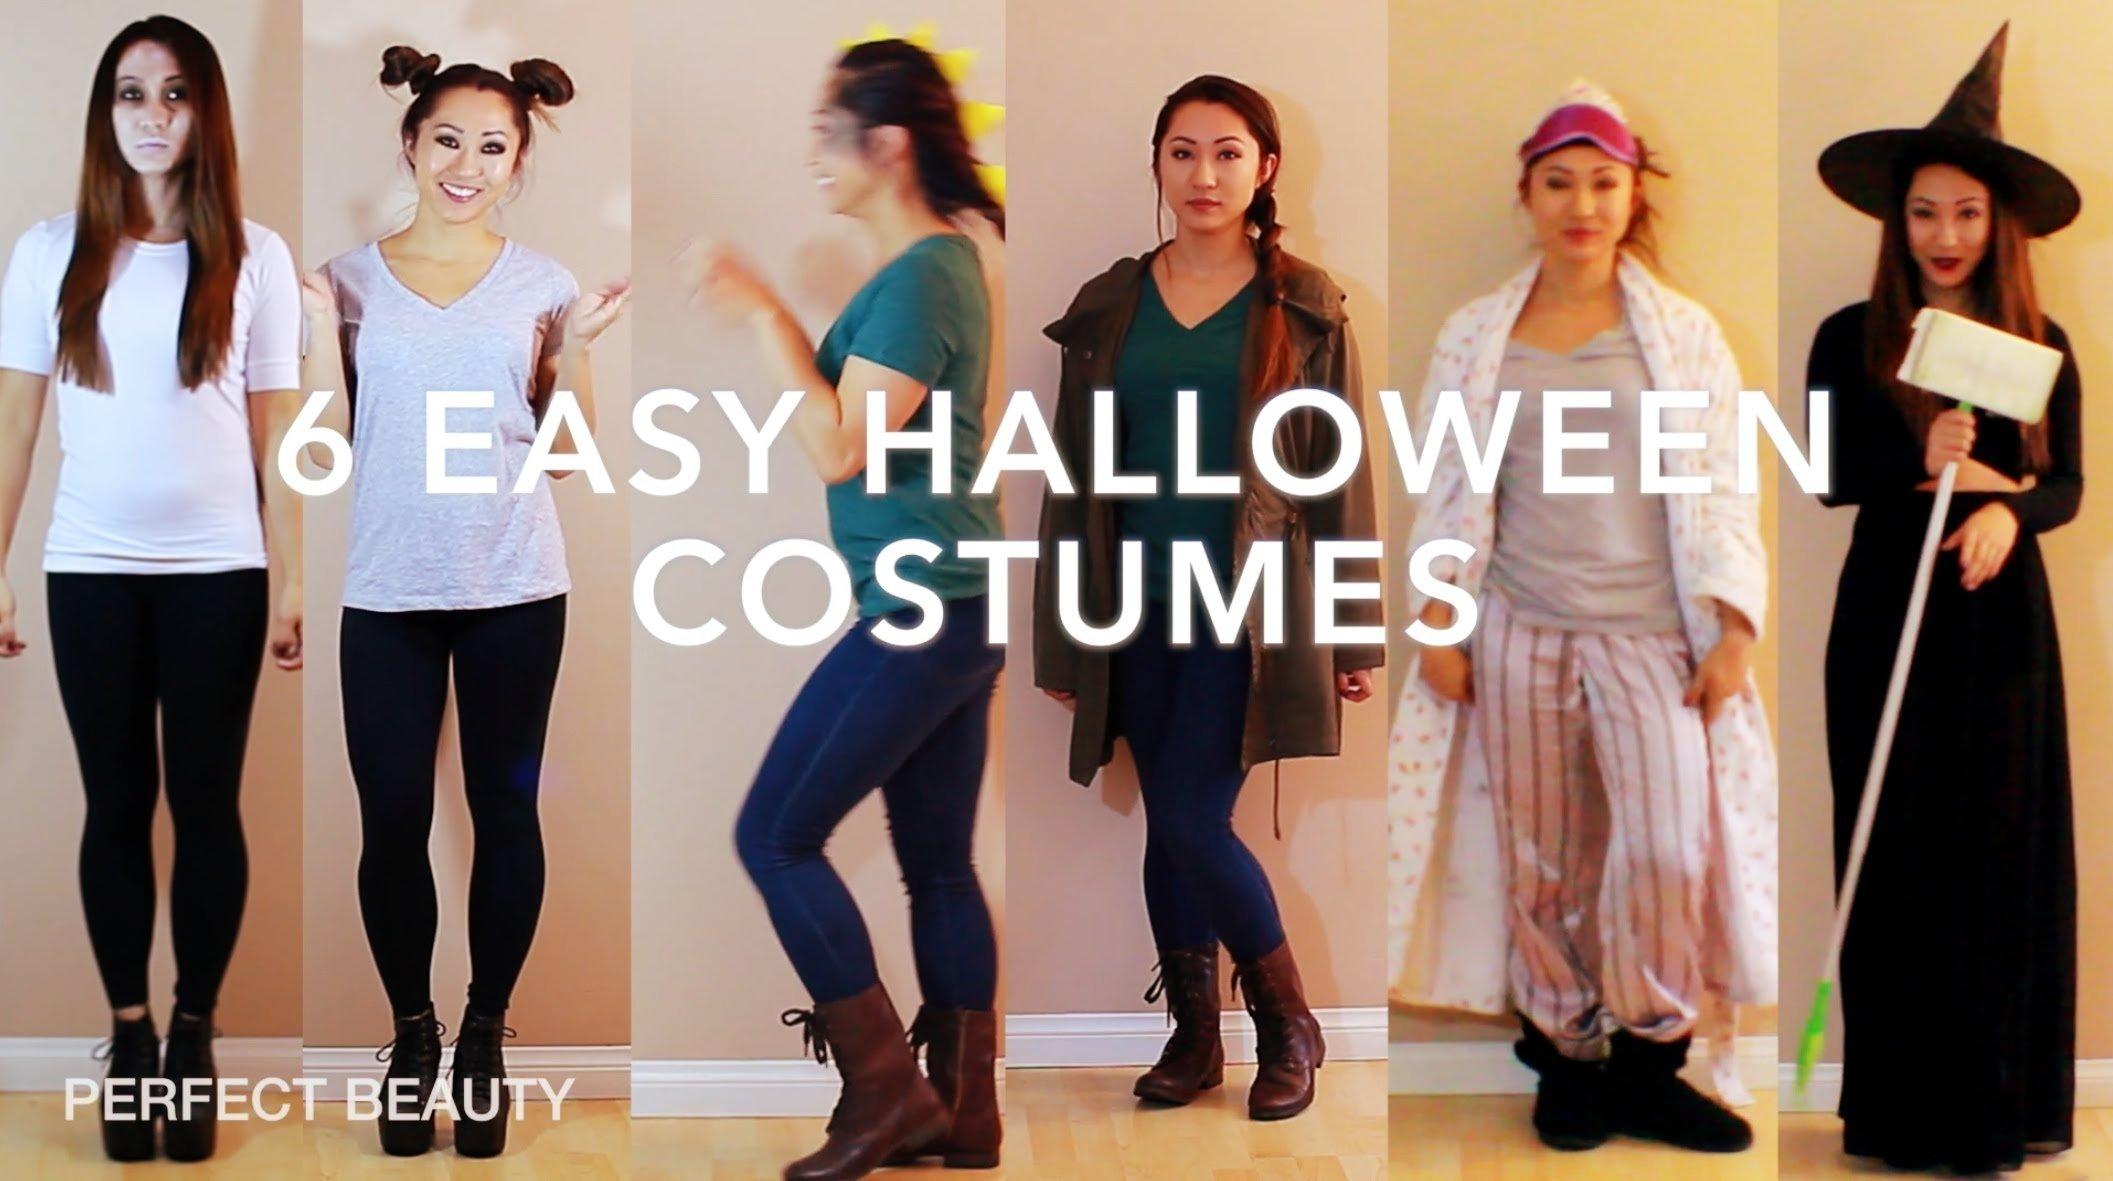 10 Stylish Make Your Own Halloween Costume Ideas last minute diy halloween costume ideas perfect beauty youtube 21 2020